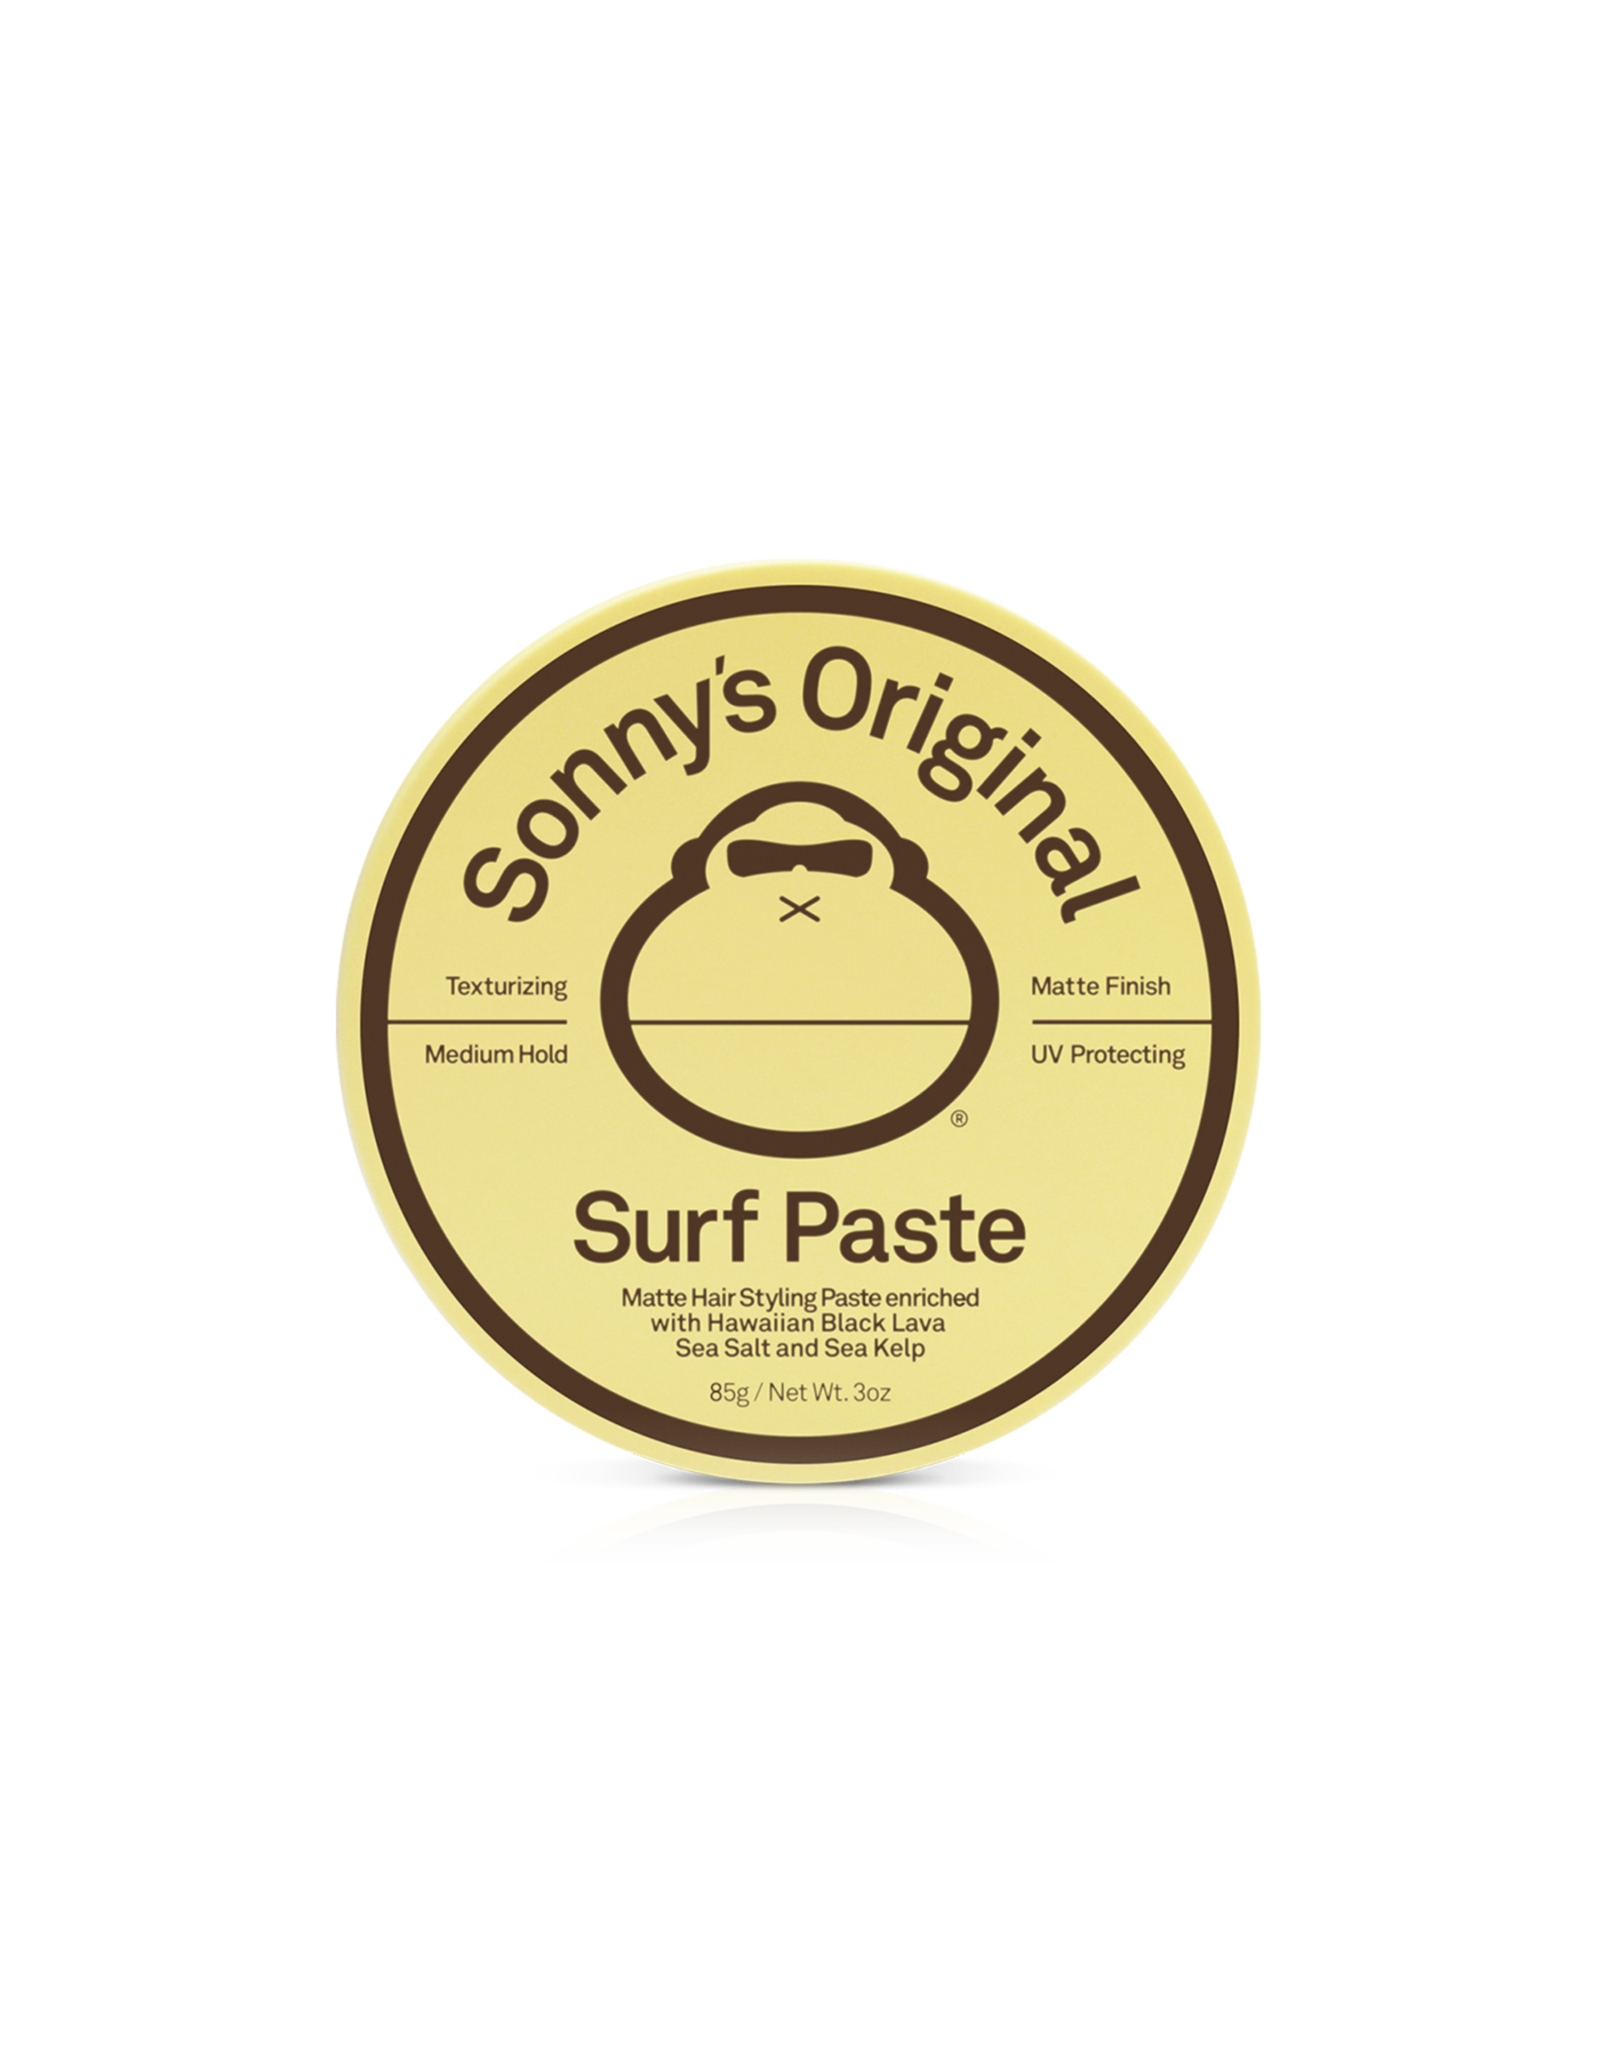 Sun Bum TEXTURIZING SURF PASTE HAIR GEL